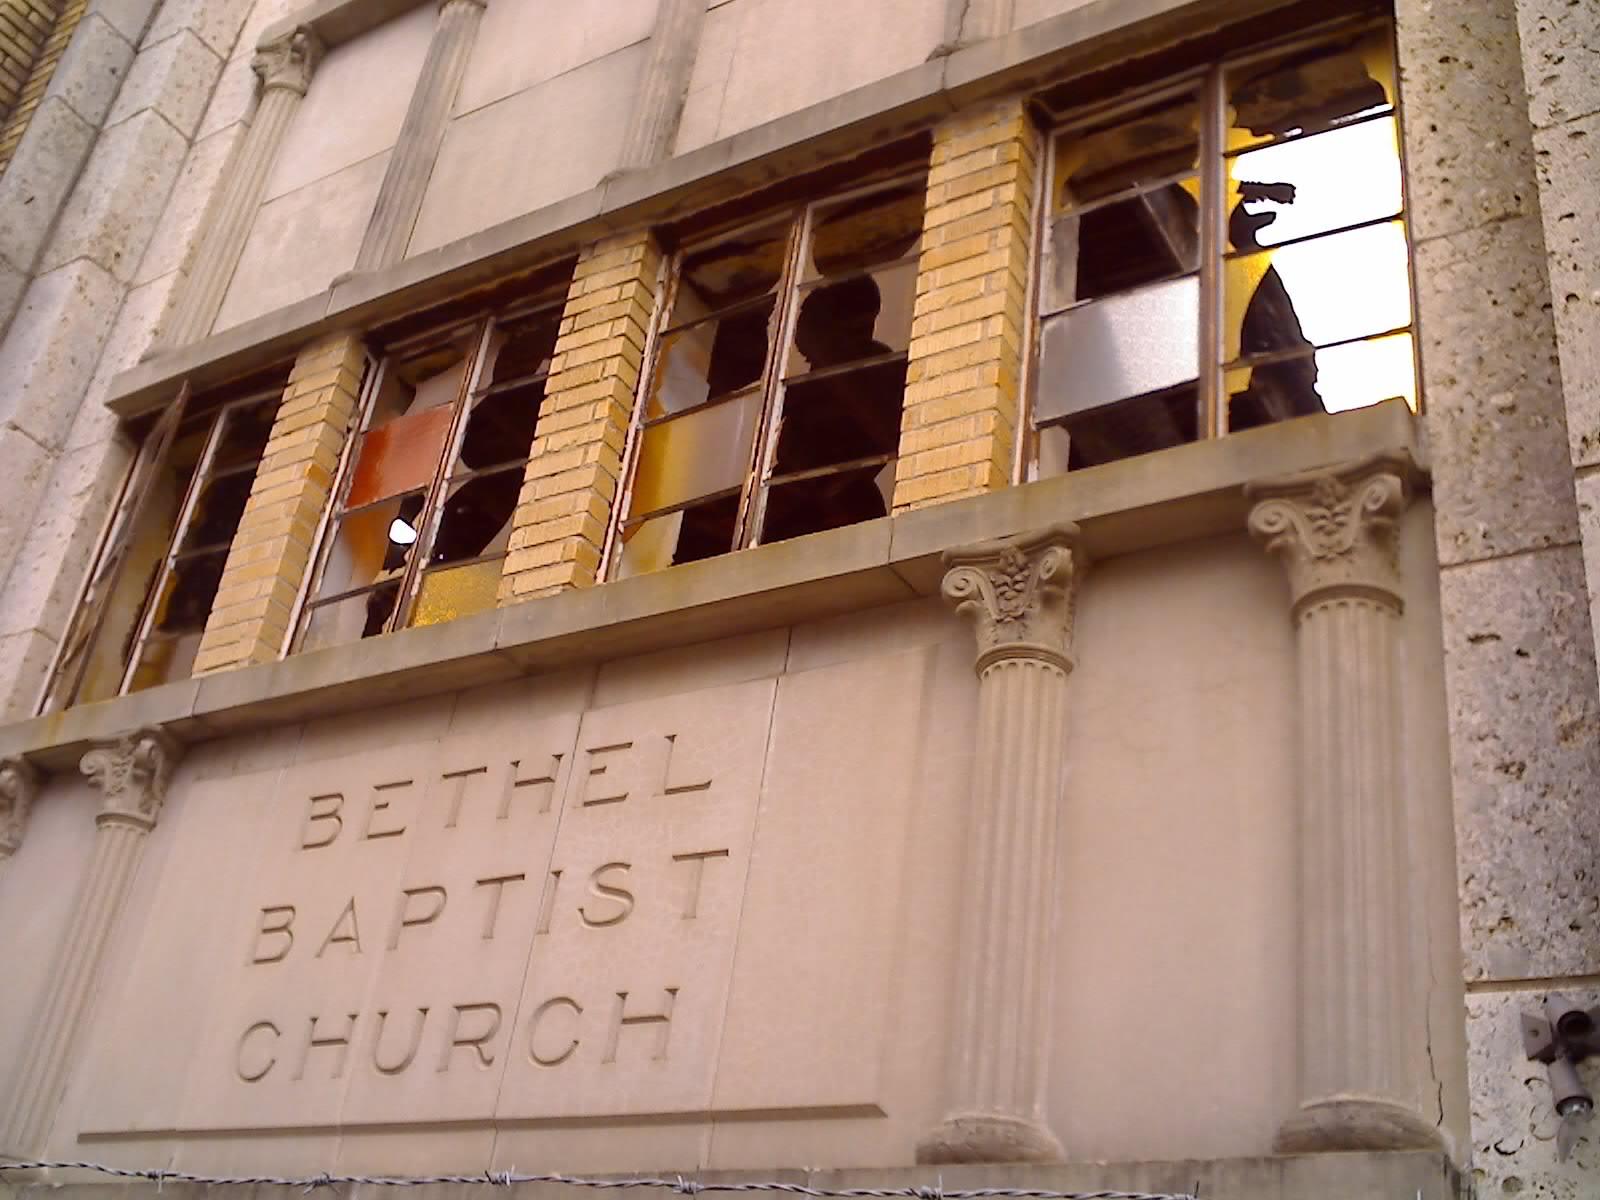 bethel baptist church downtown houston tin can alley